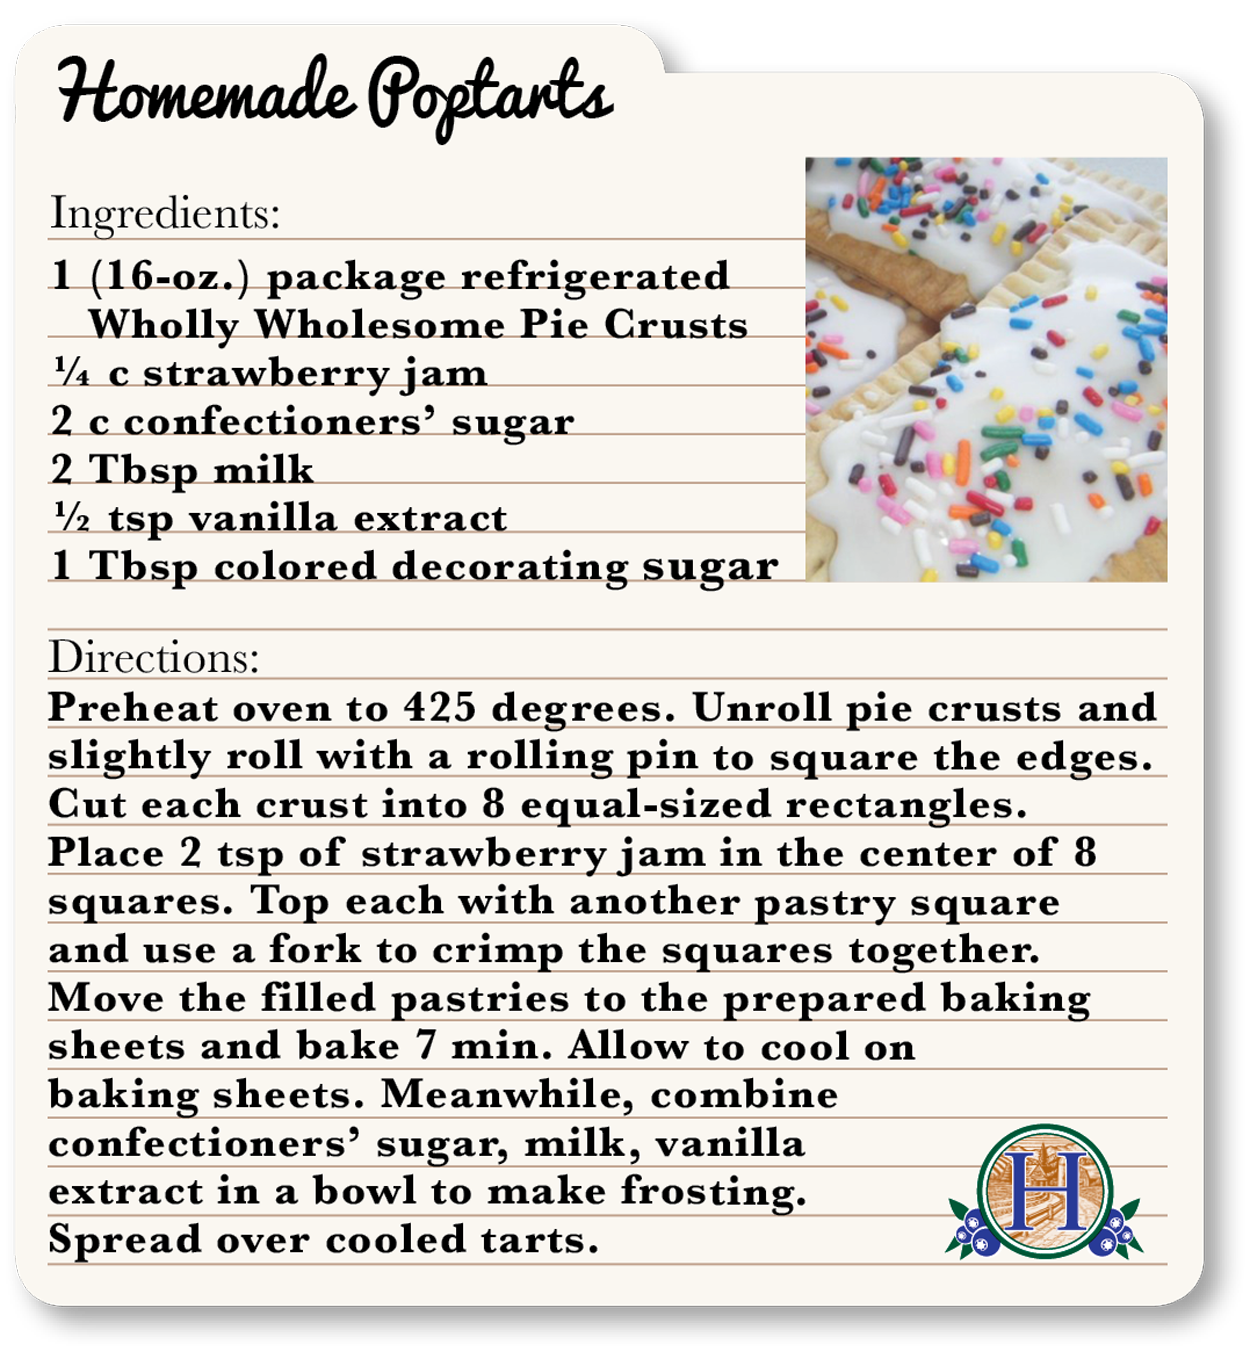 Homemade-Poptarts.png